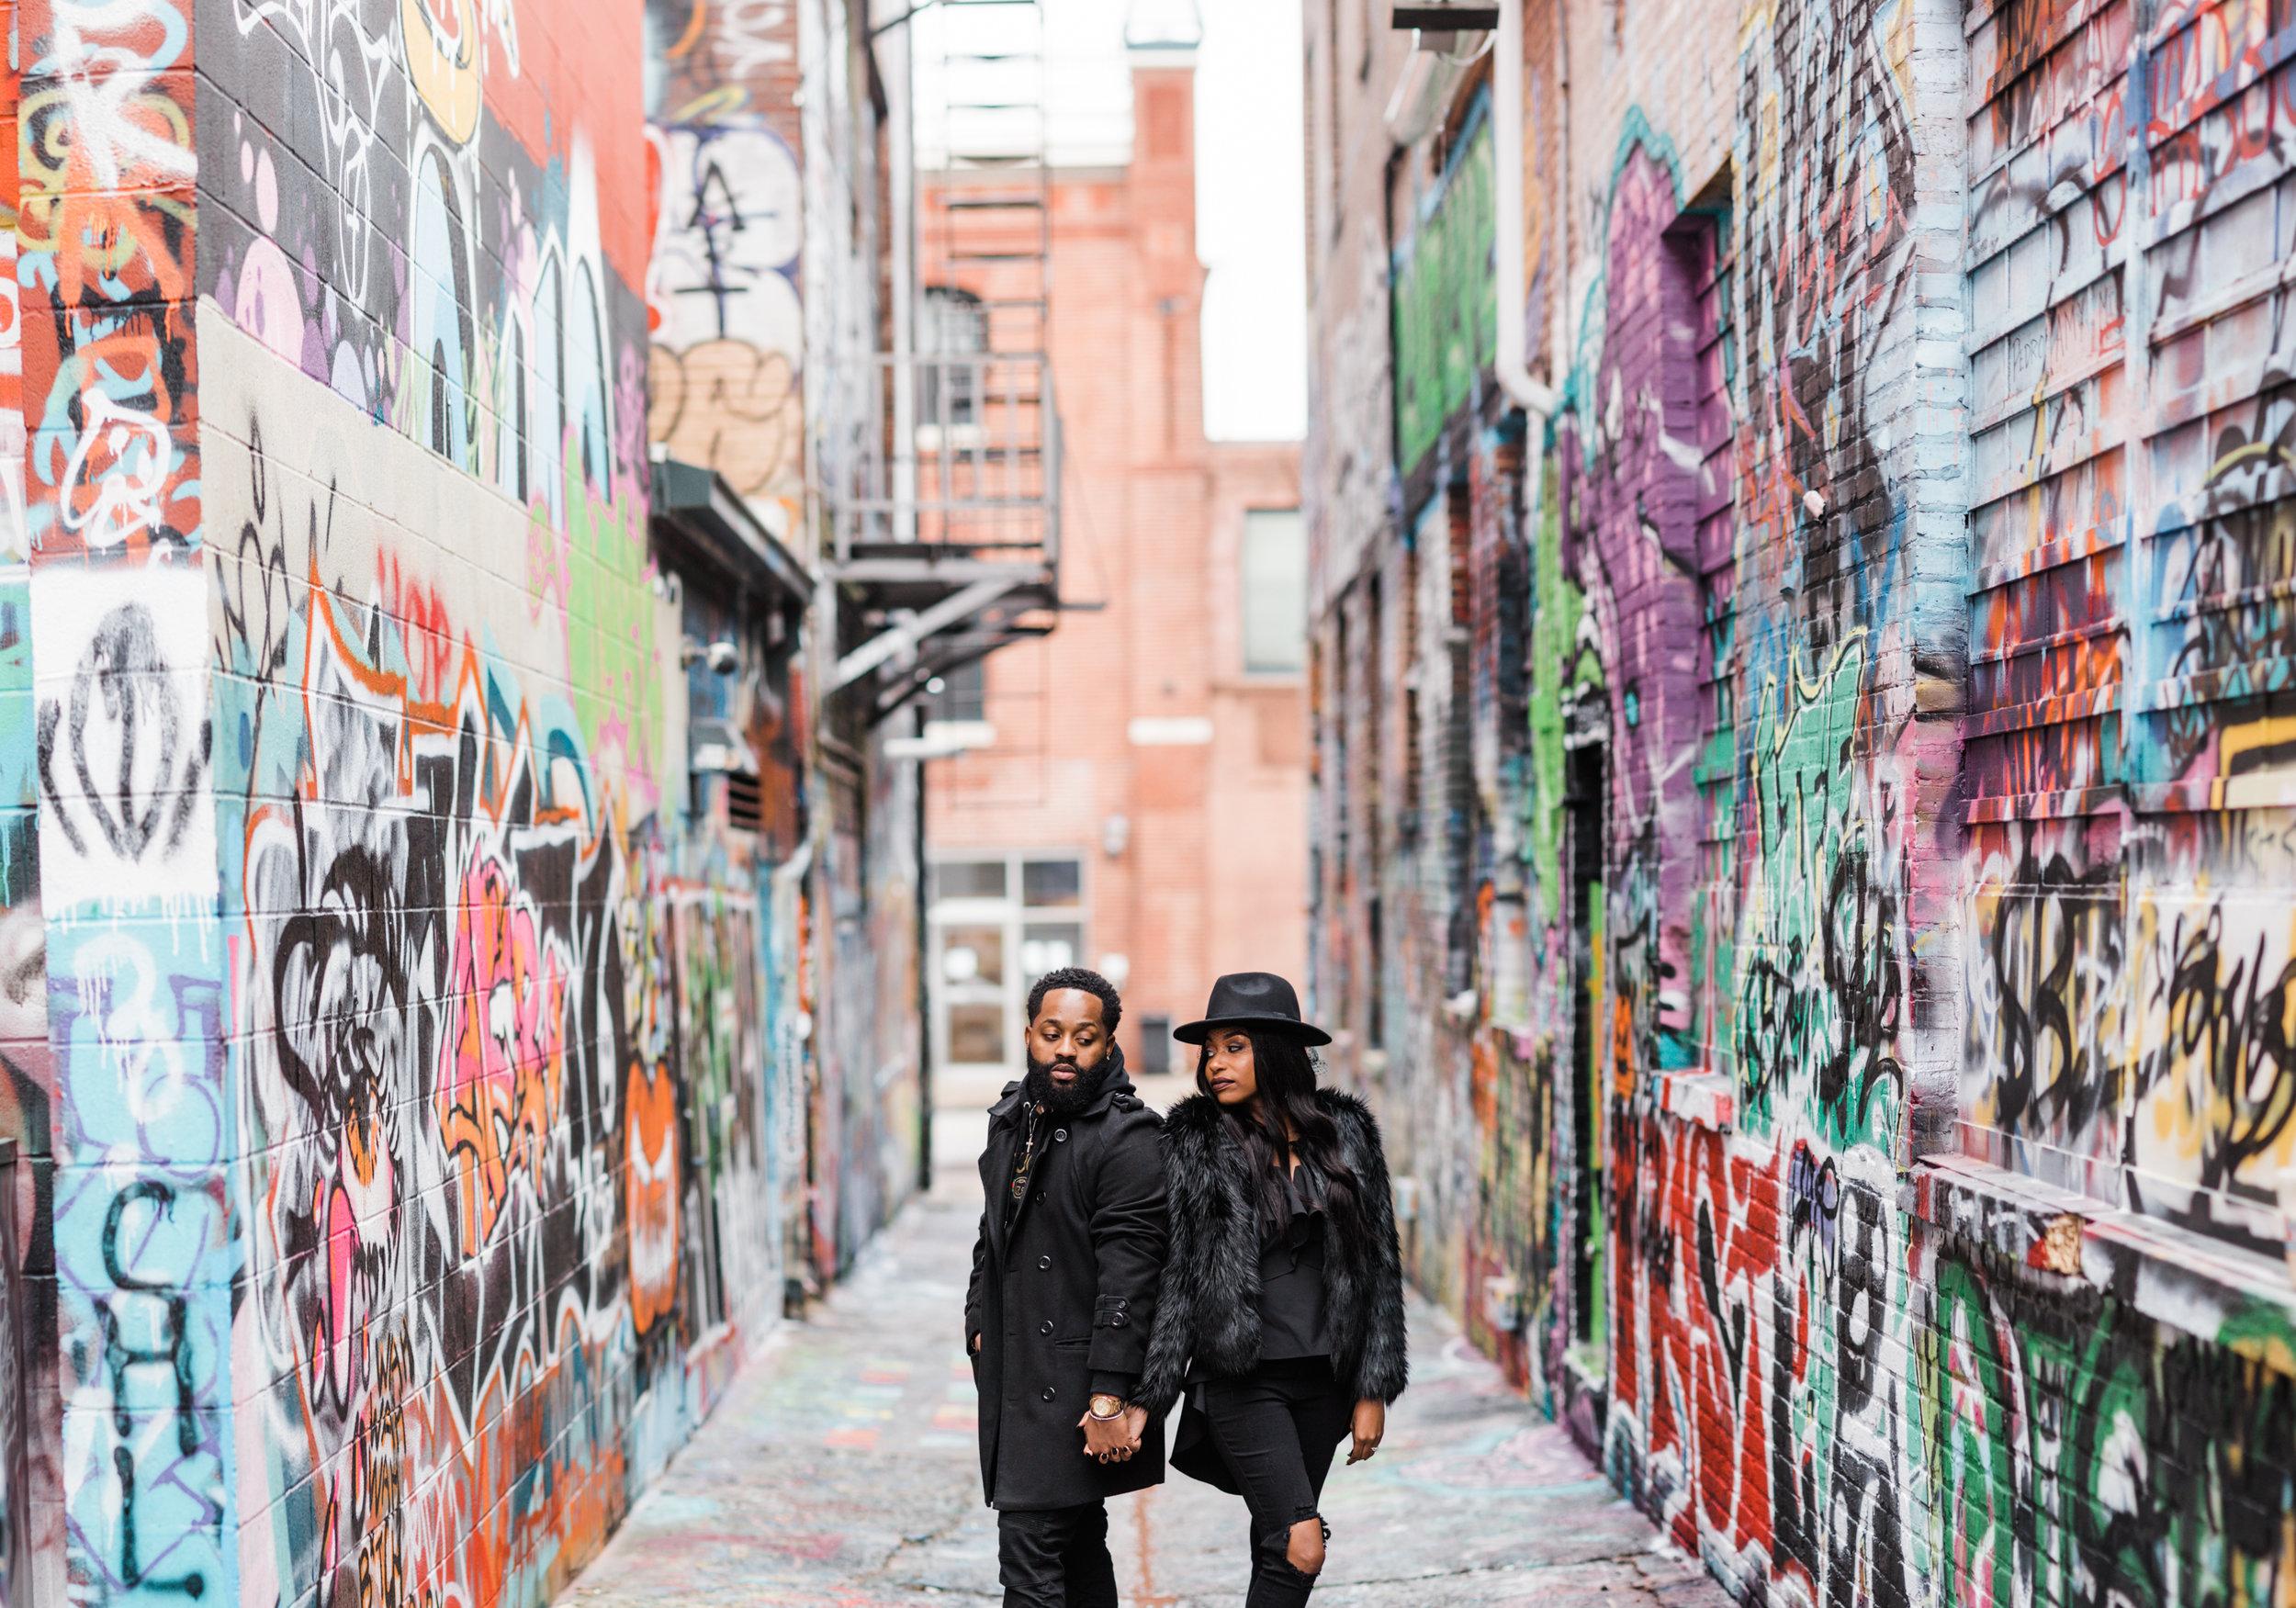 Creative Baltimore Graffiti Alley Engagement Session Megapixels Media Photography-1.jpg